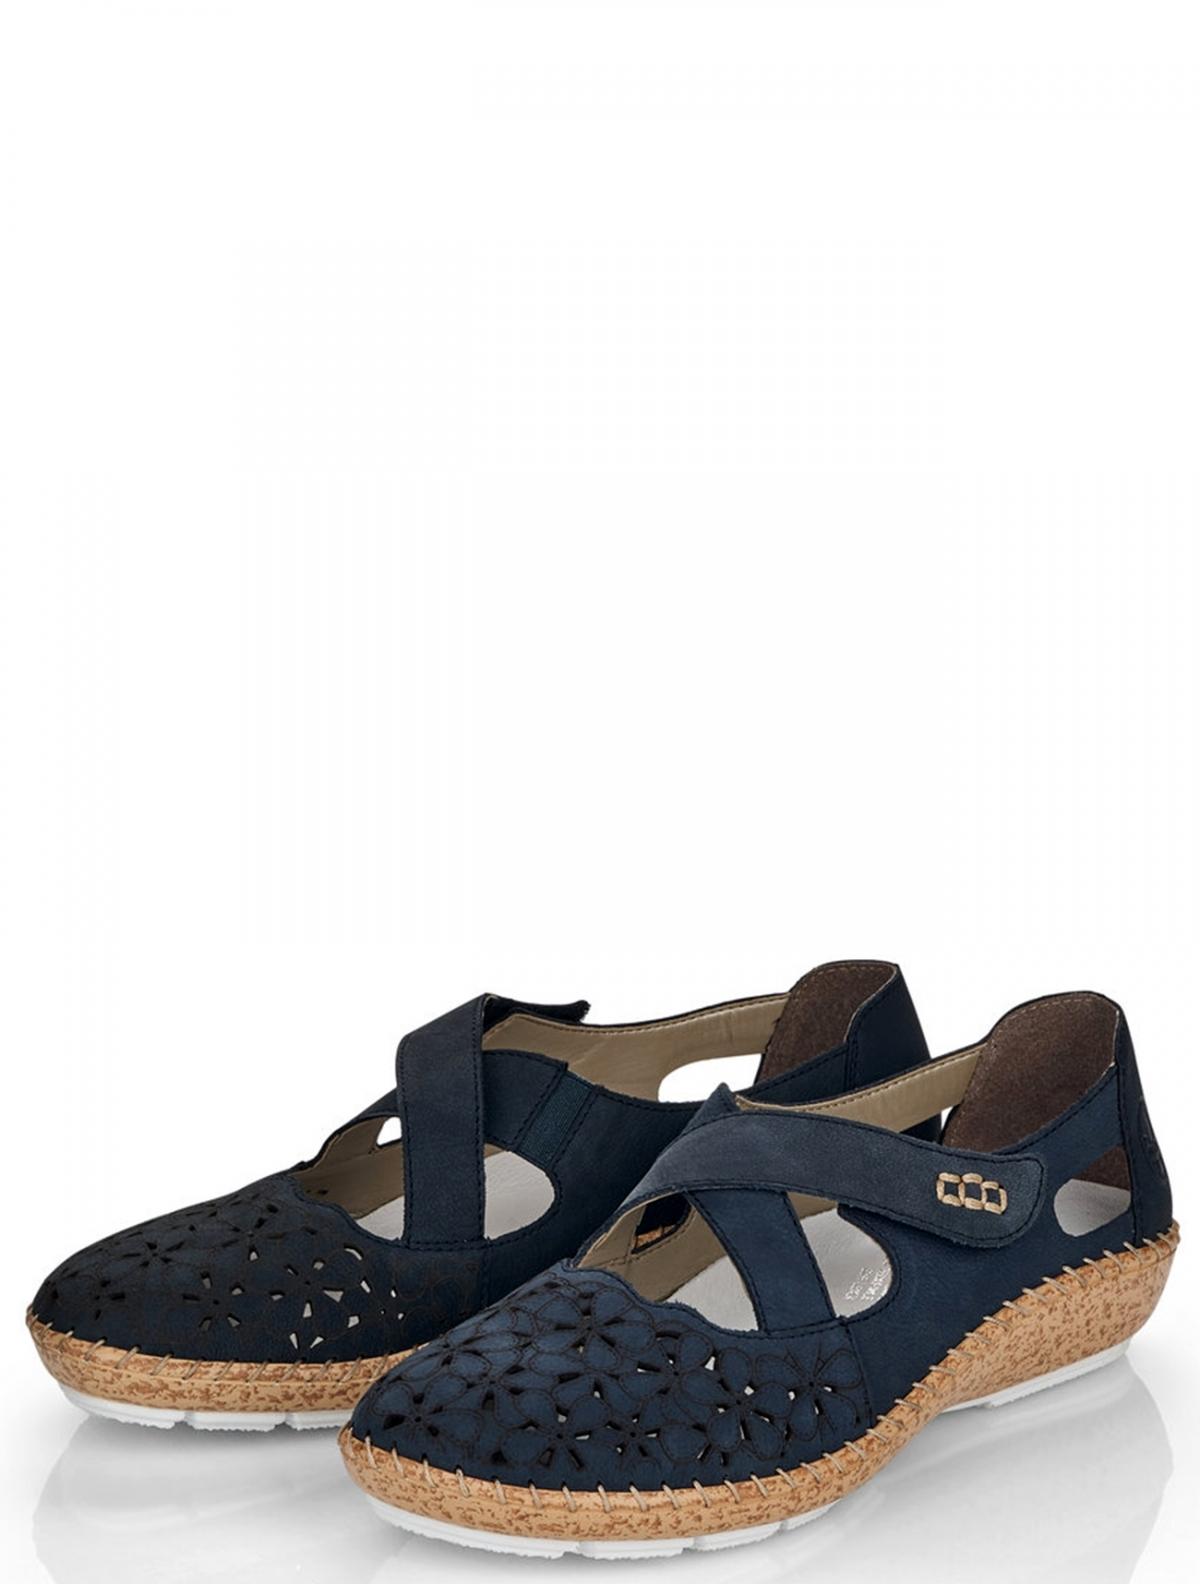 Rieker 44856-14 женские сандали